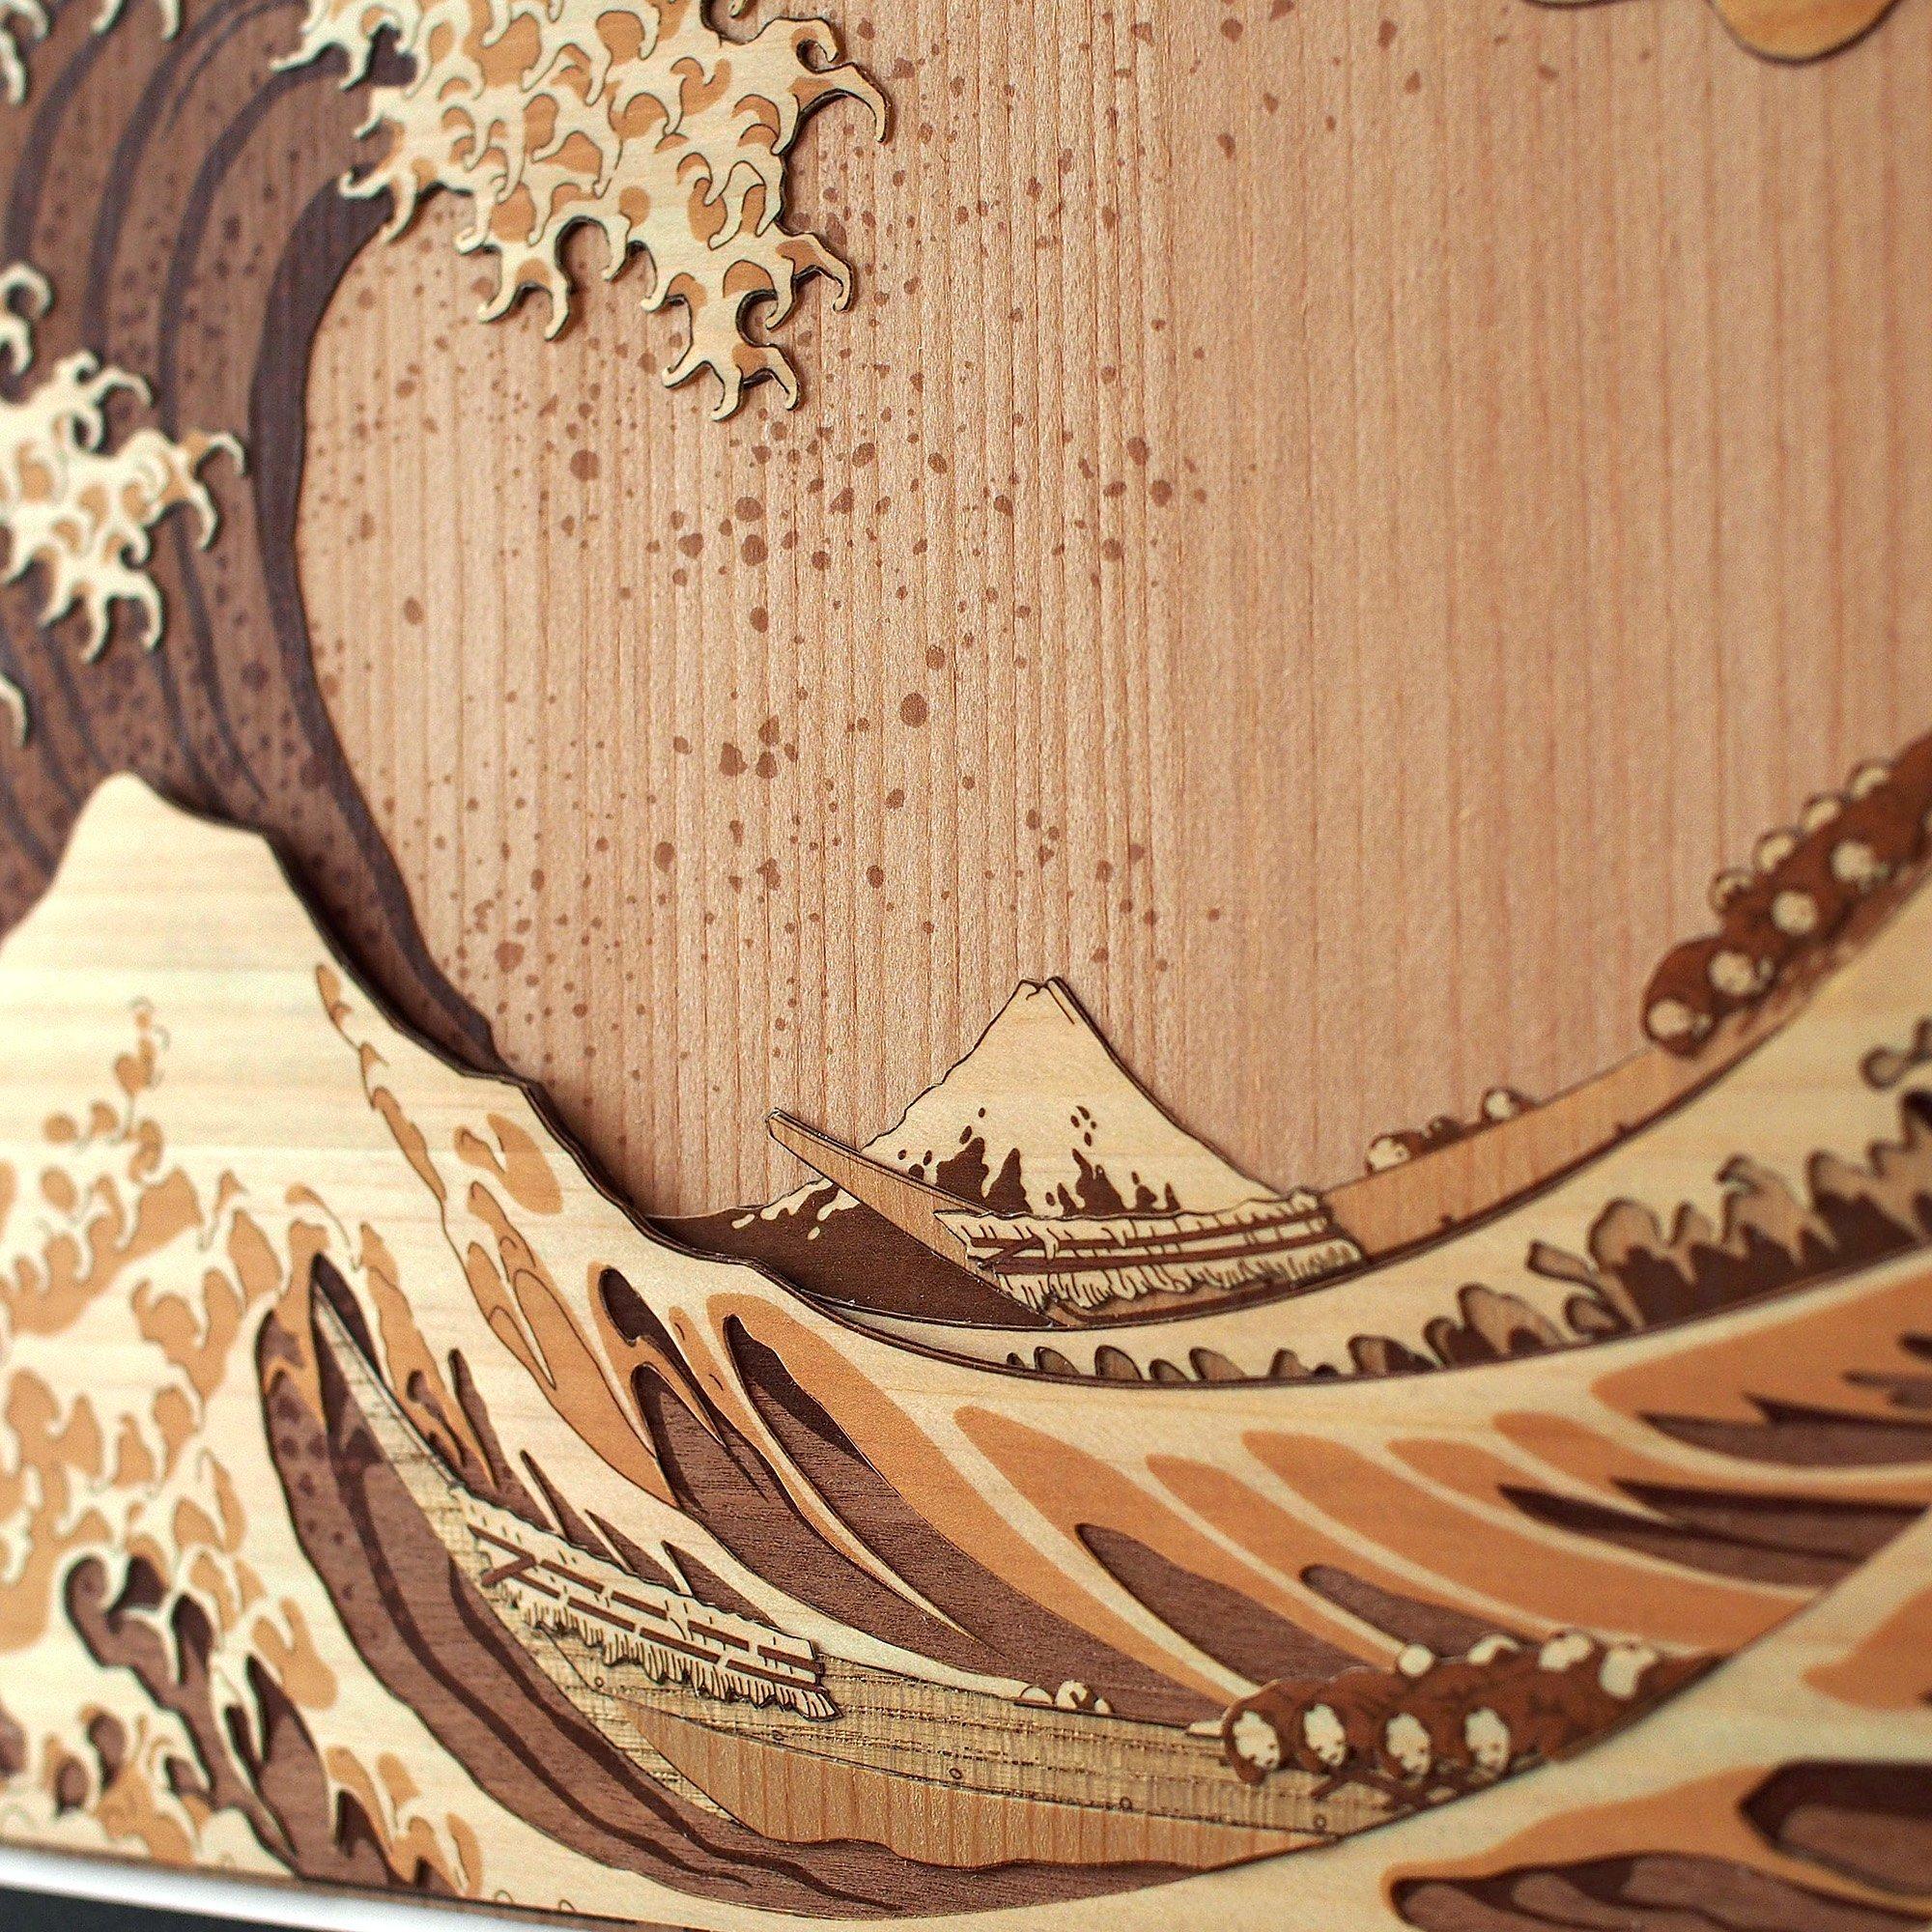 KINOWA Ukiyoe Art Kit Kiharie The Great Wave Off Kanagawa Thirty-six Views of Mount Fuji by Hokusai Made in Japan by KINOWA (Image #7)